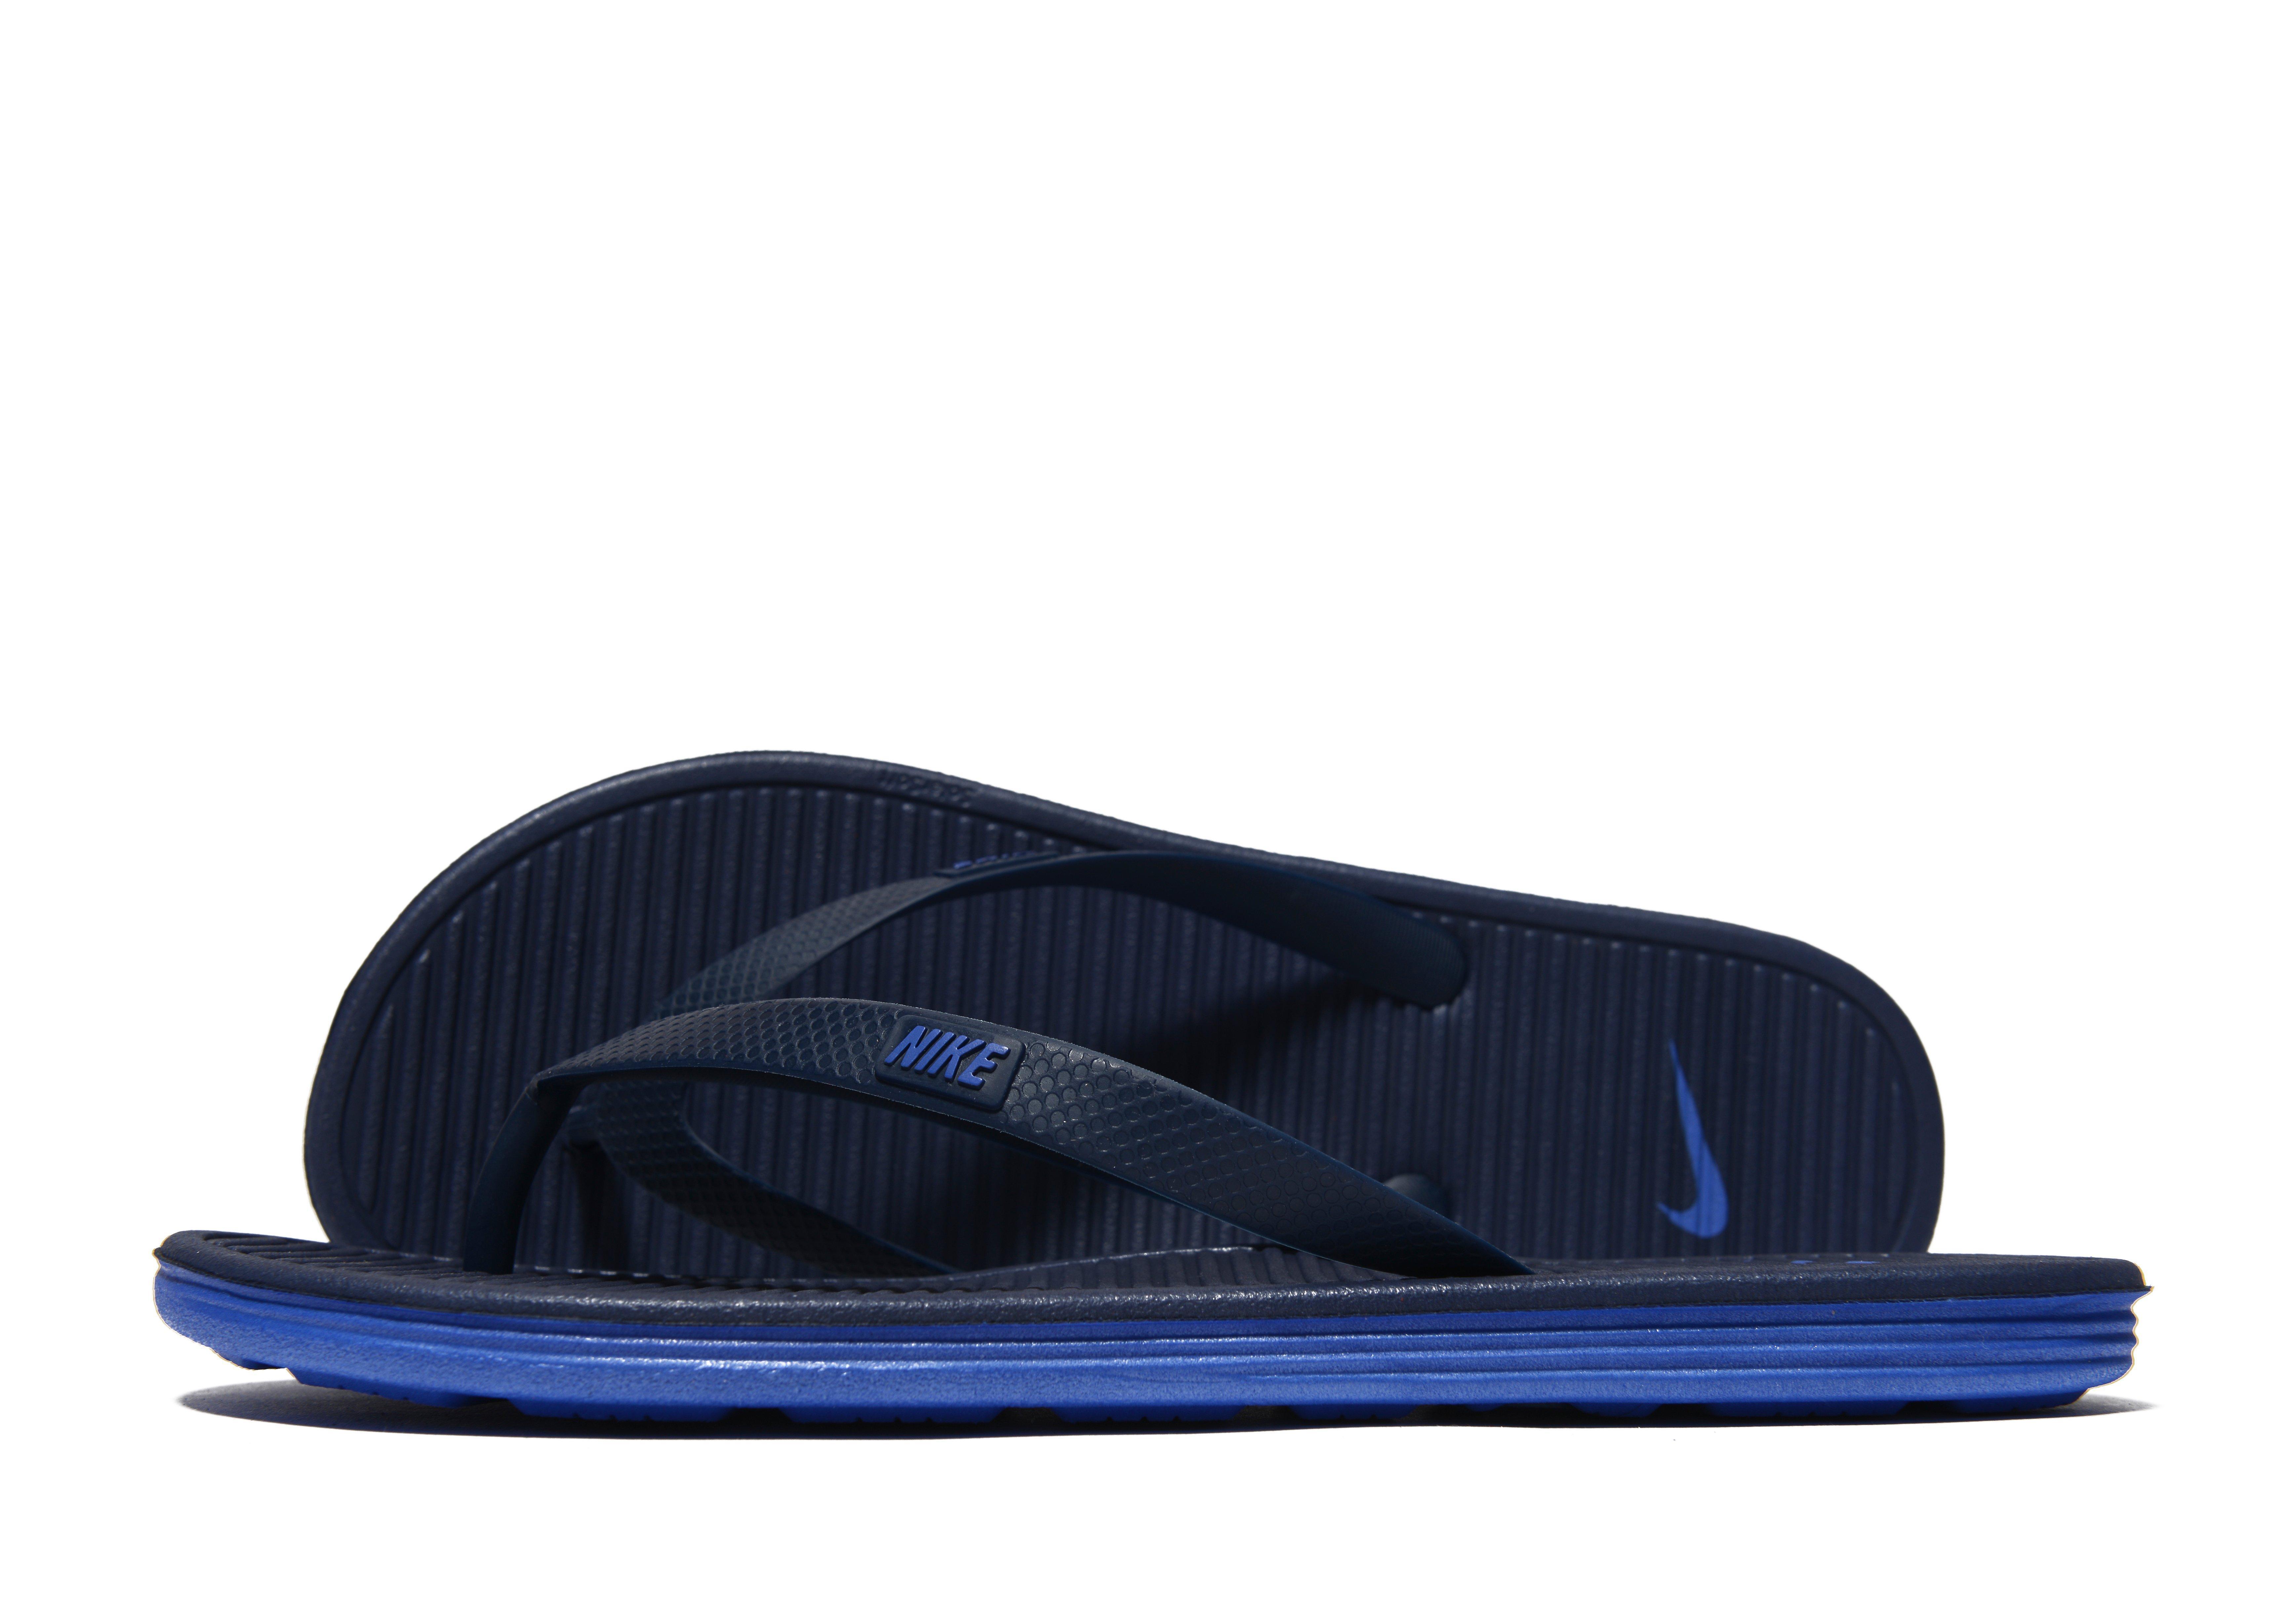 7bba2abb625 Nike Solarsoft Ii Flip Flops in Blue for Men - Lyst